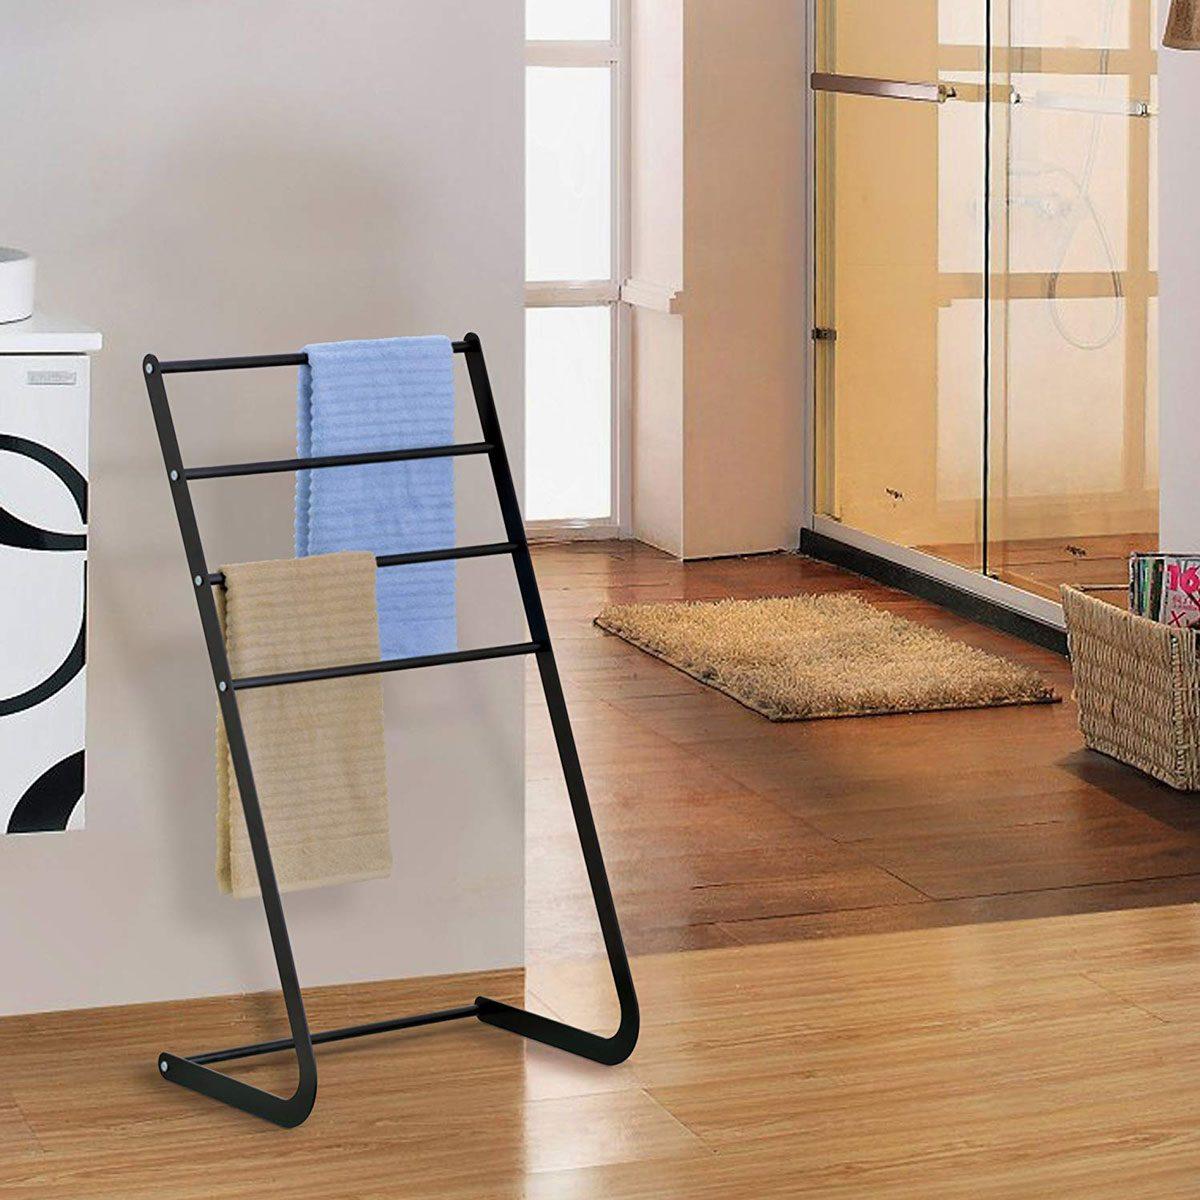 MyGift-32-Inch-Freestanding-Metal-Towel-Rack